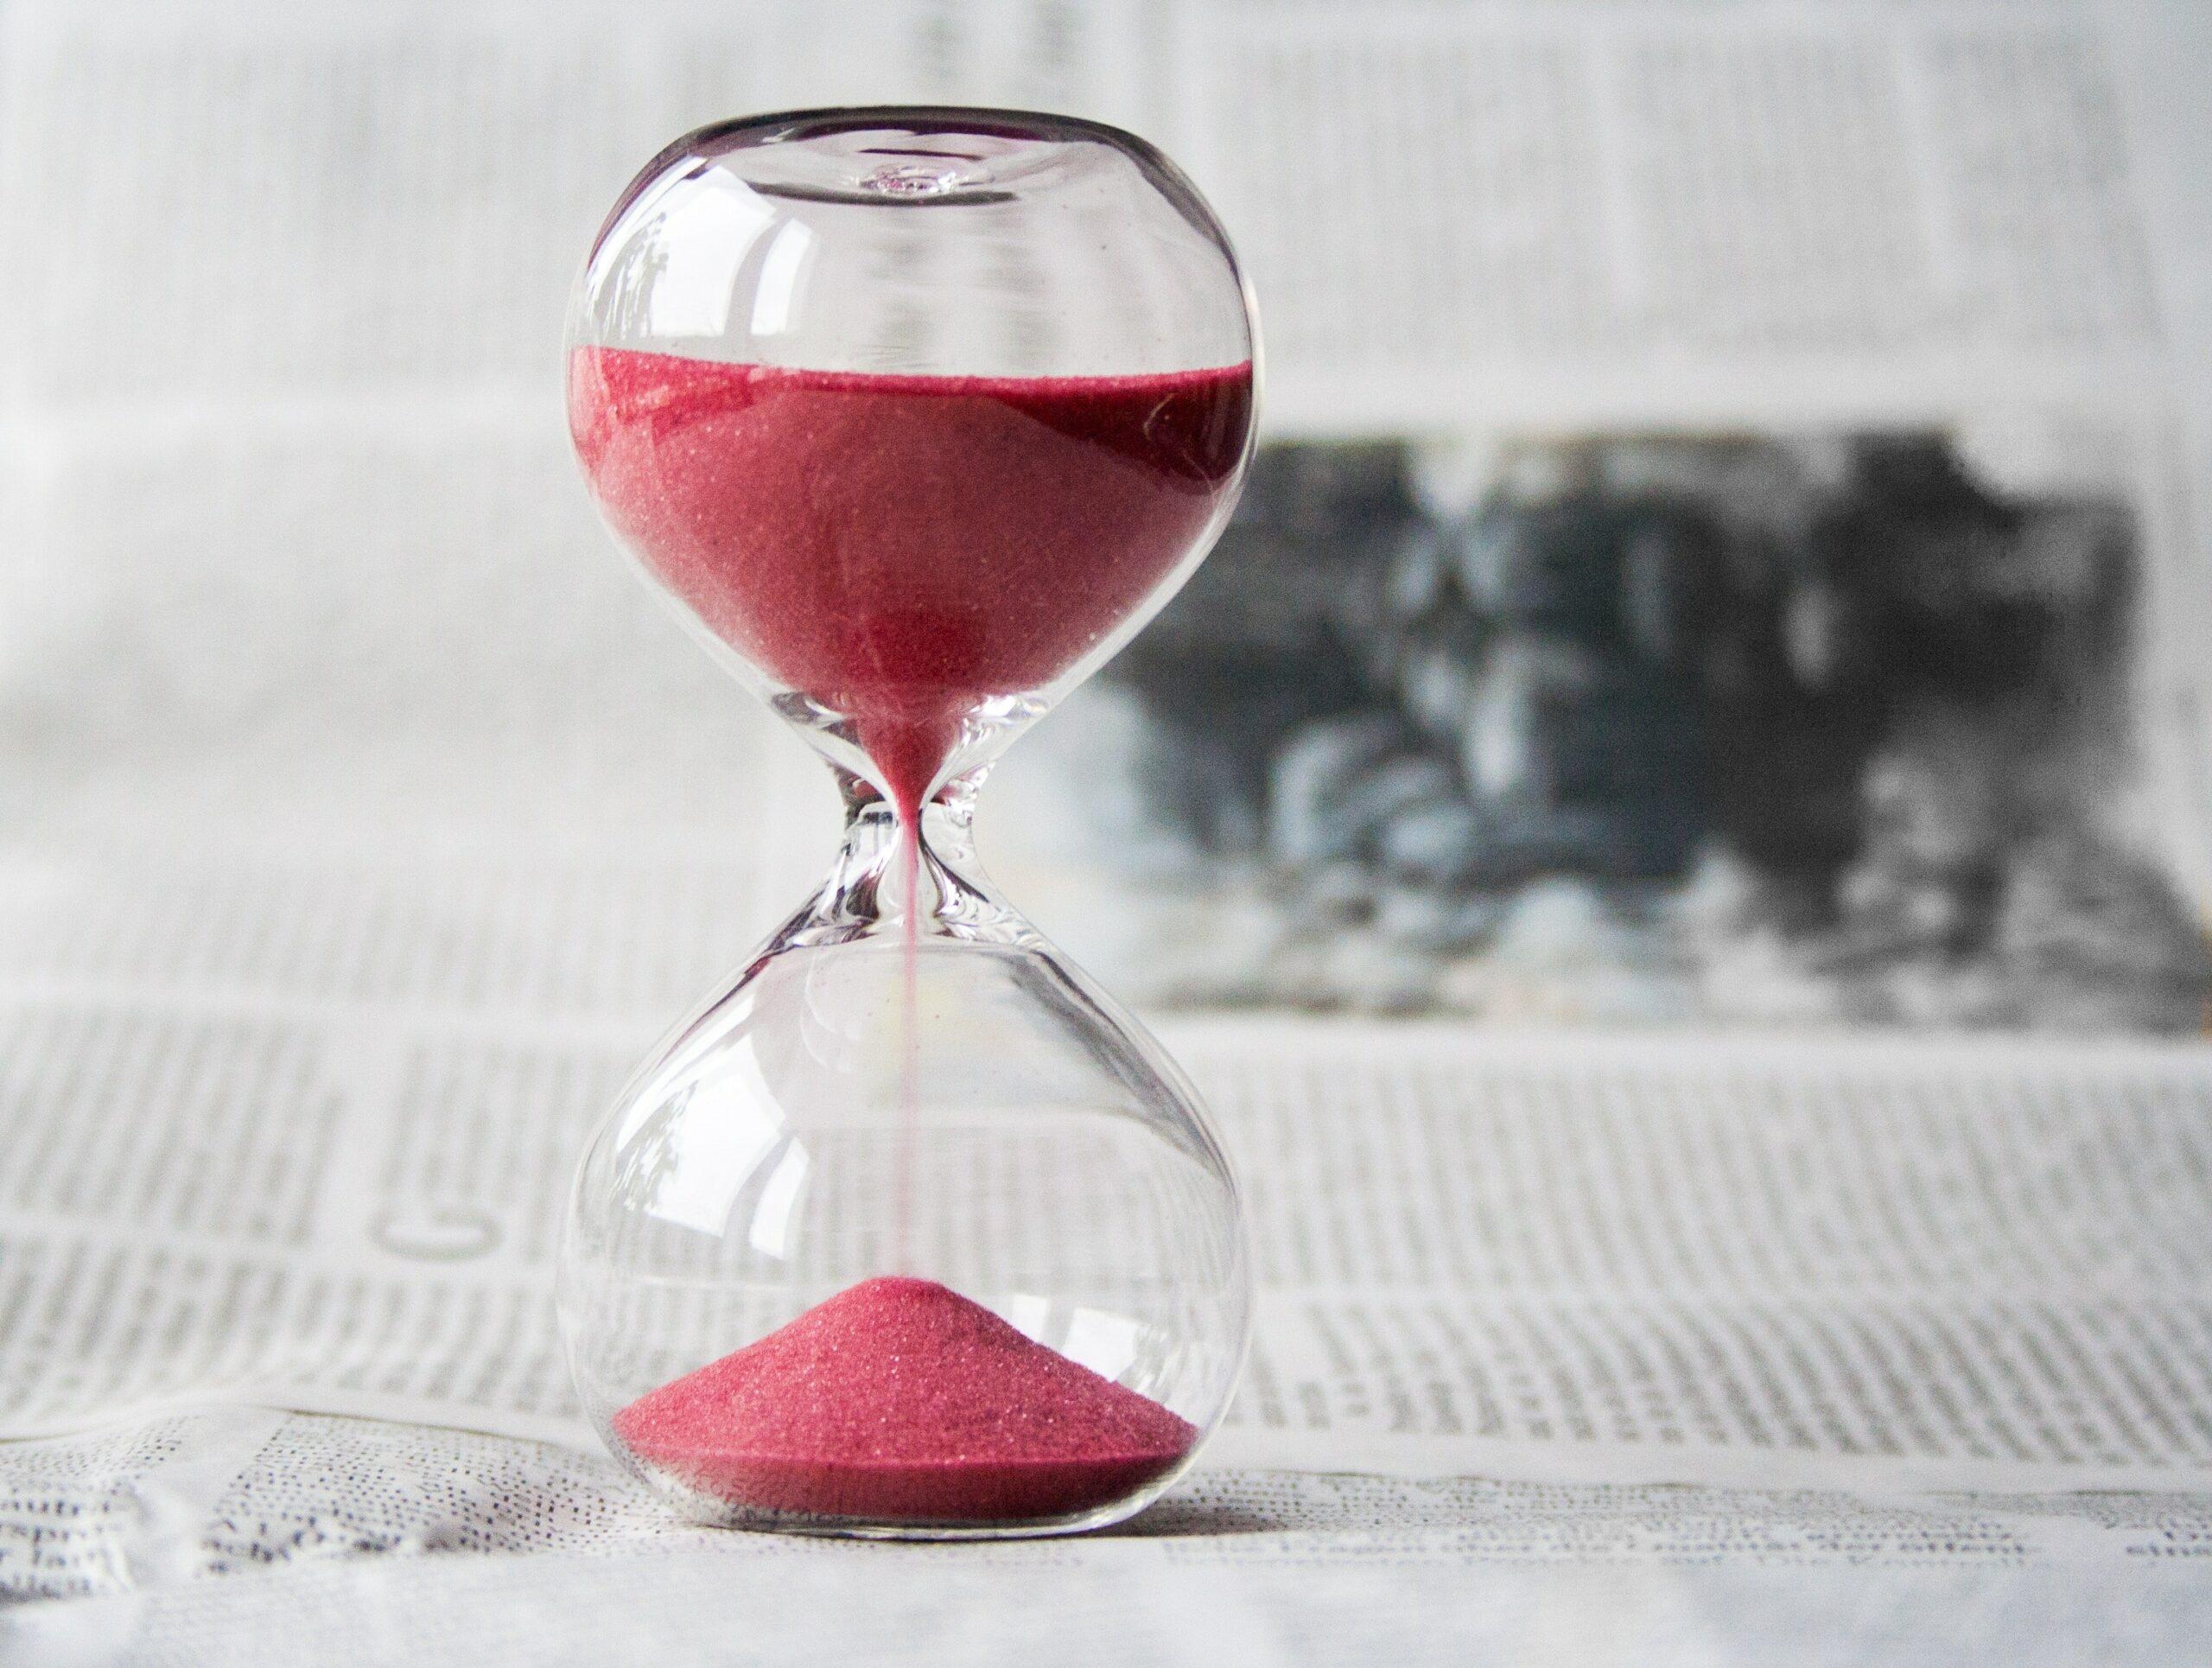 Кредит за 30 хвилин в Україні